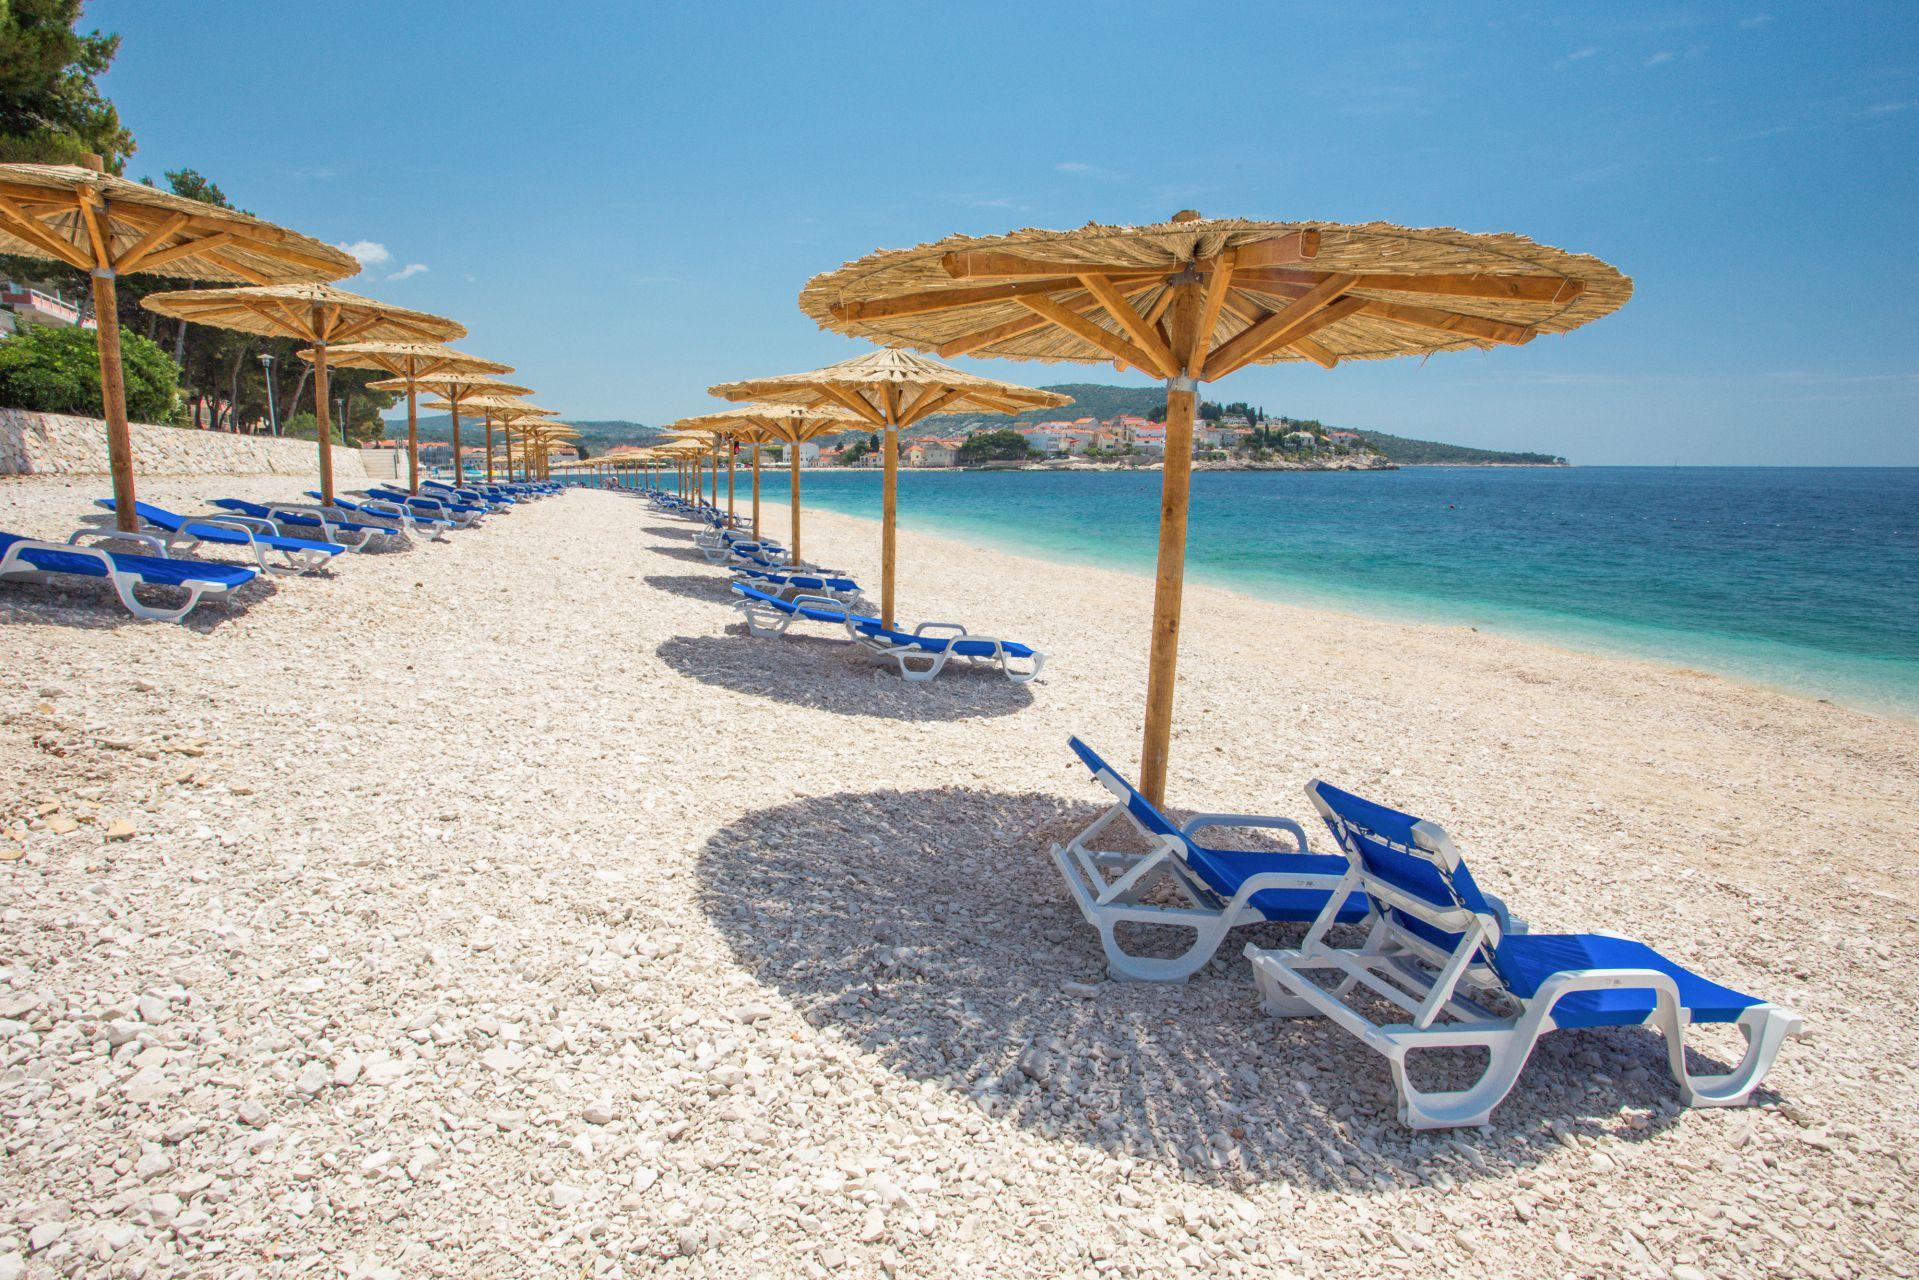 beach 04 14638582198 o 1 - Zora Hotel